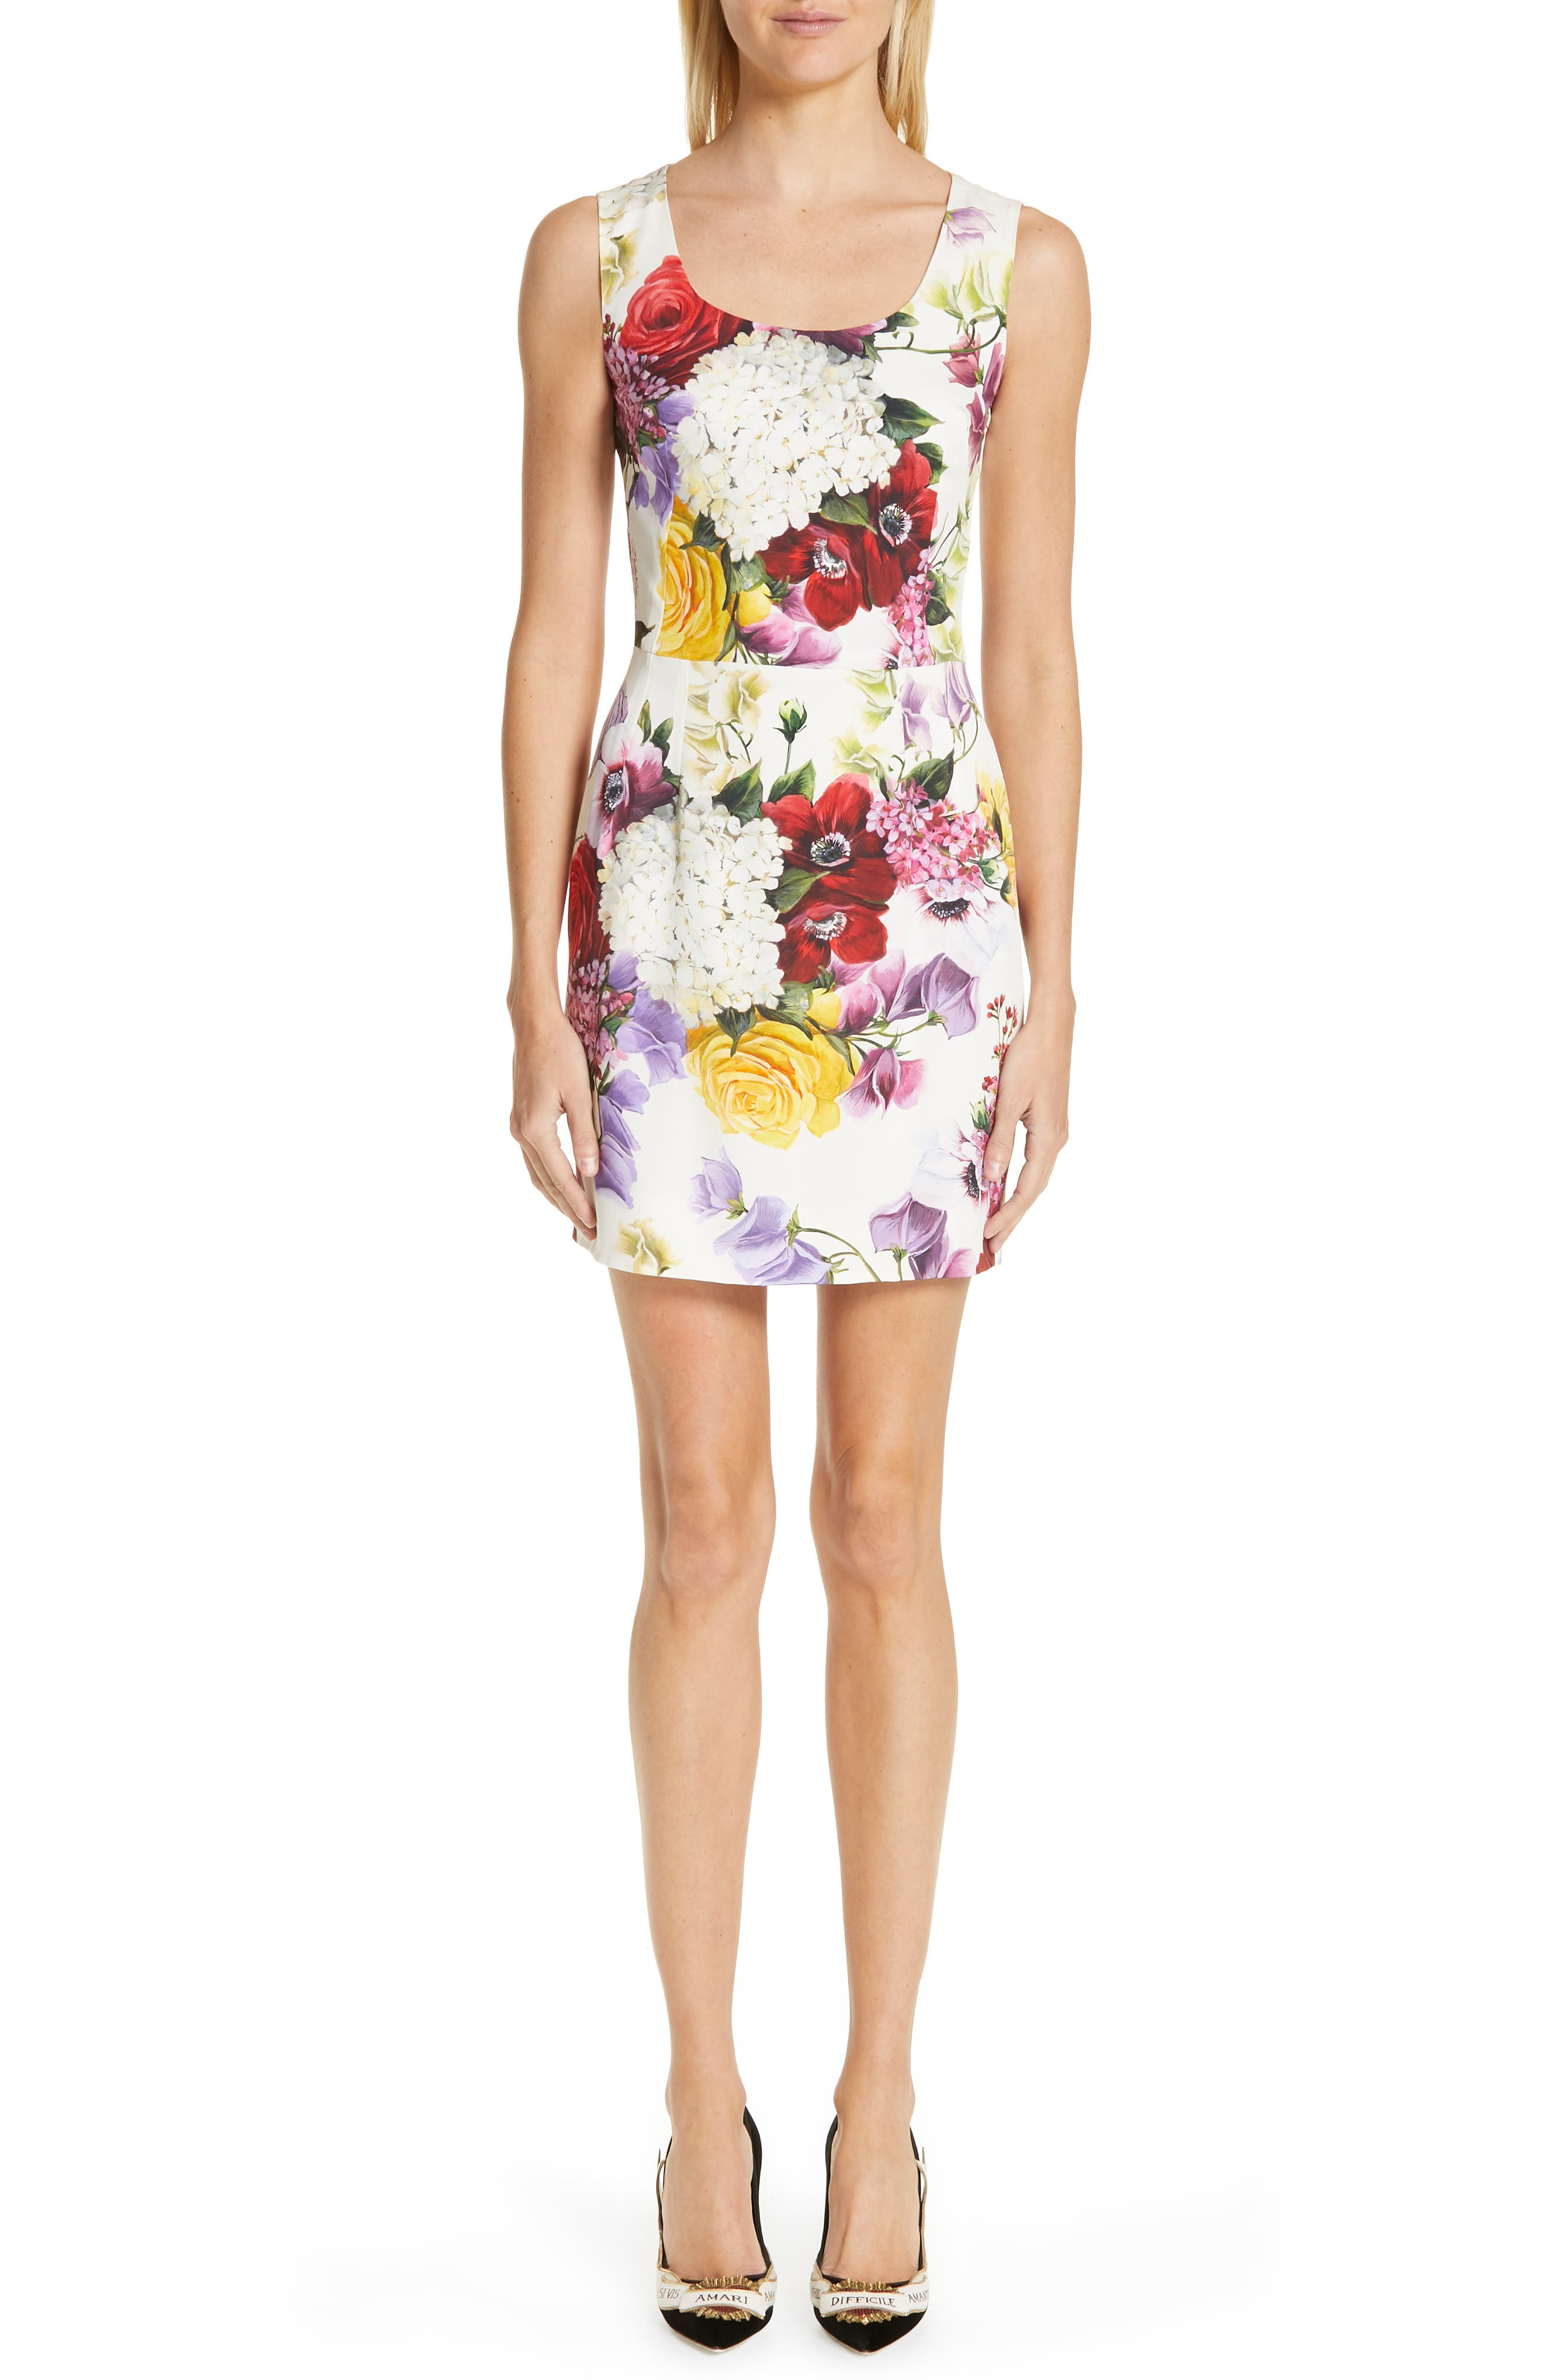 Dolce & gabbana Floral Print Stretch Silk Charmeuse Minidress, US / 42 IT - White